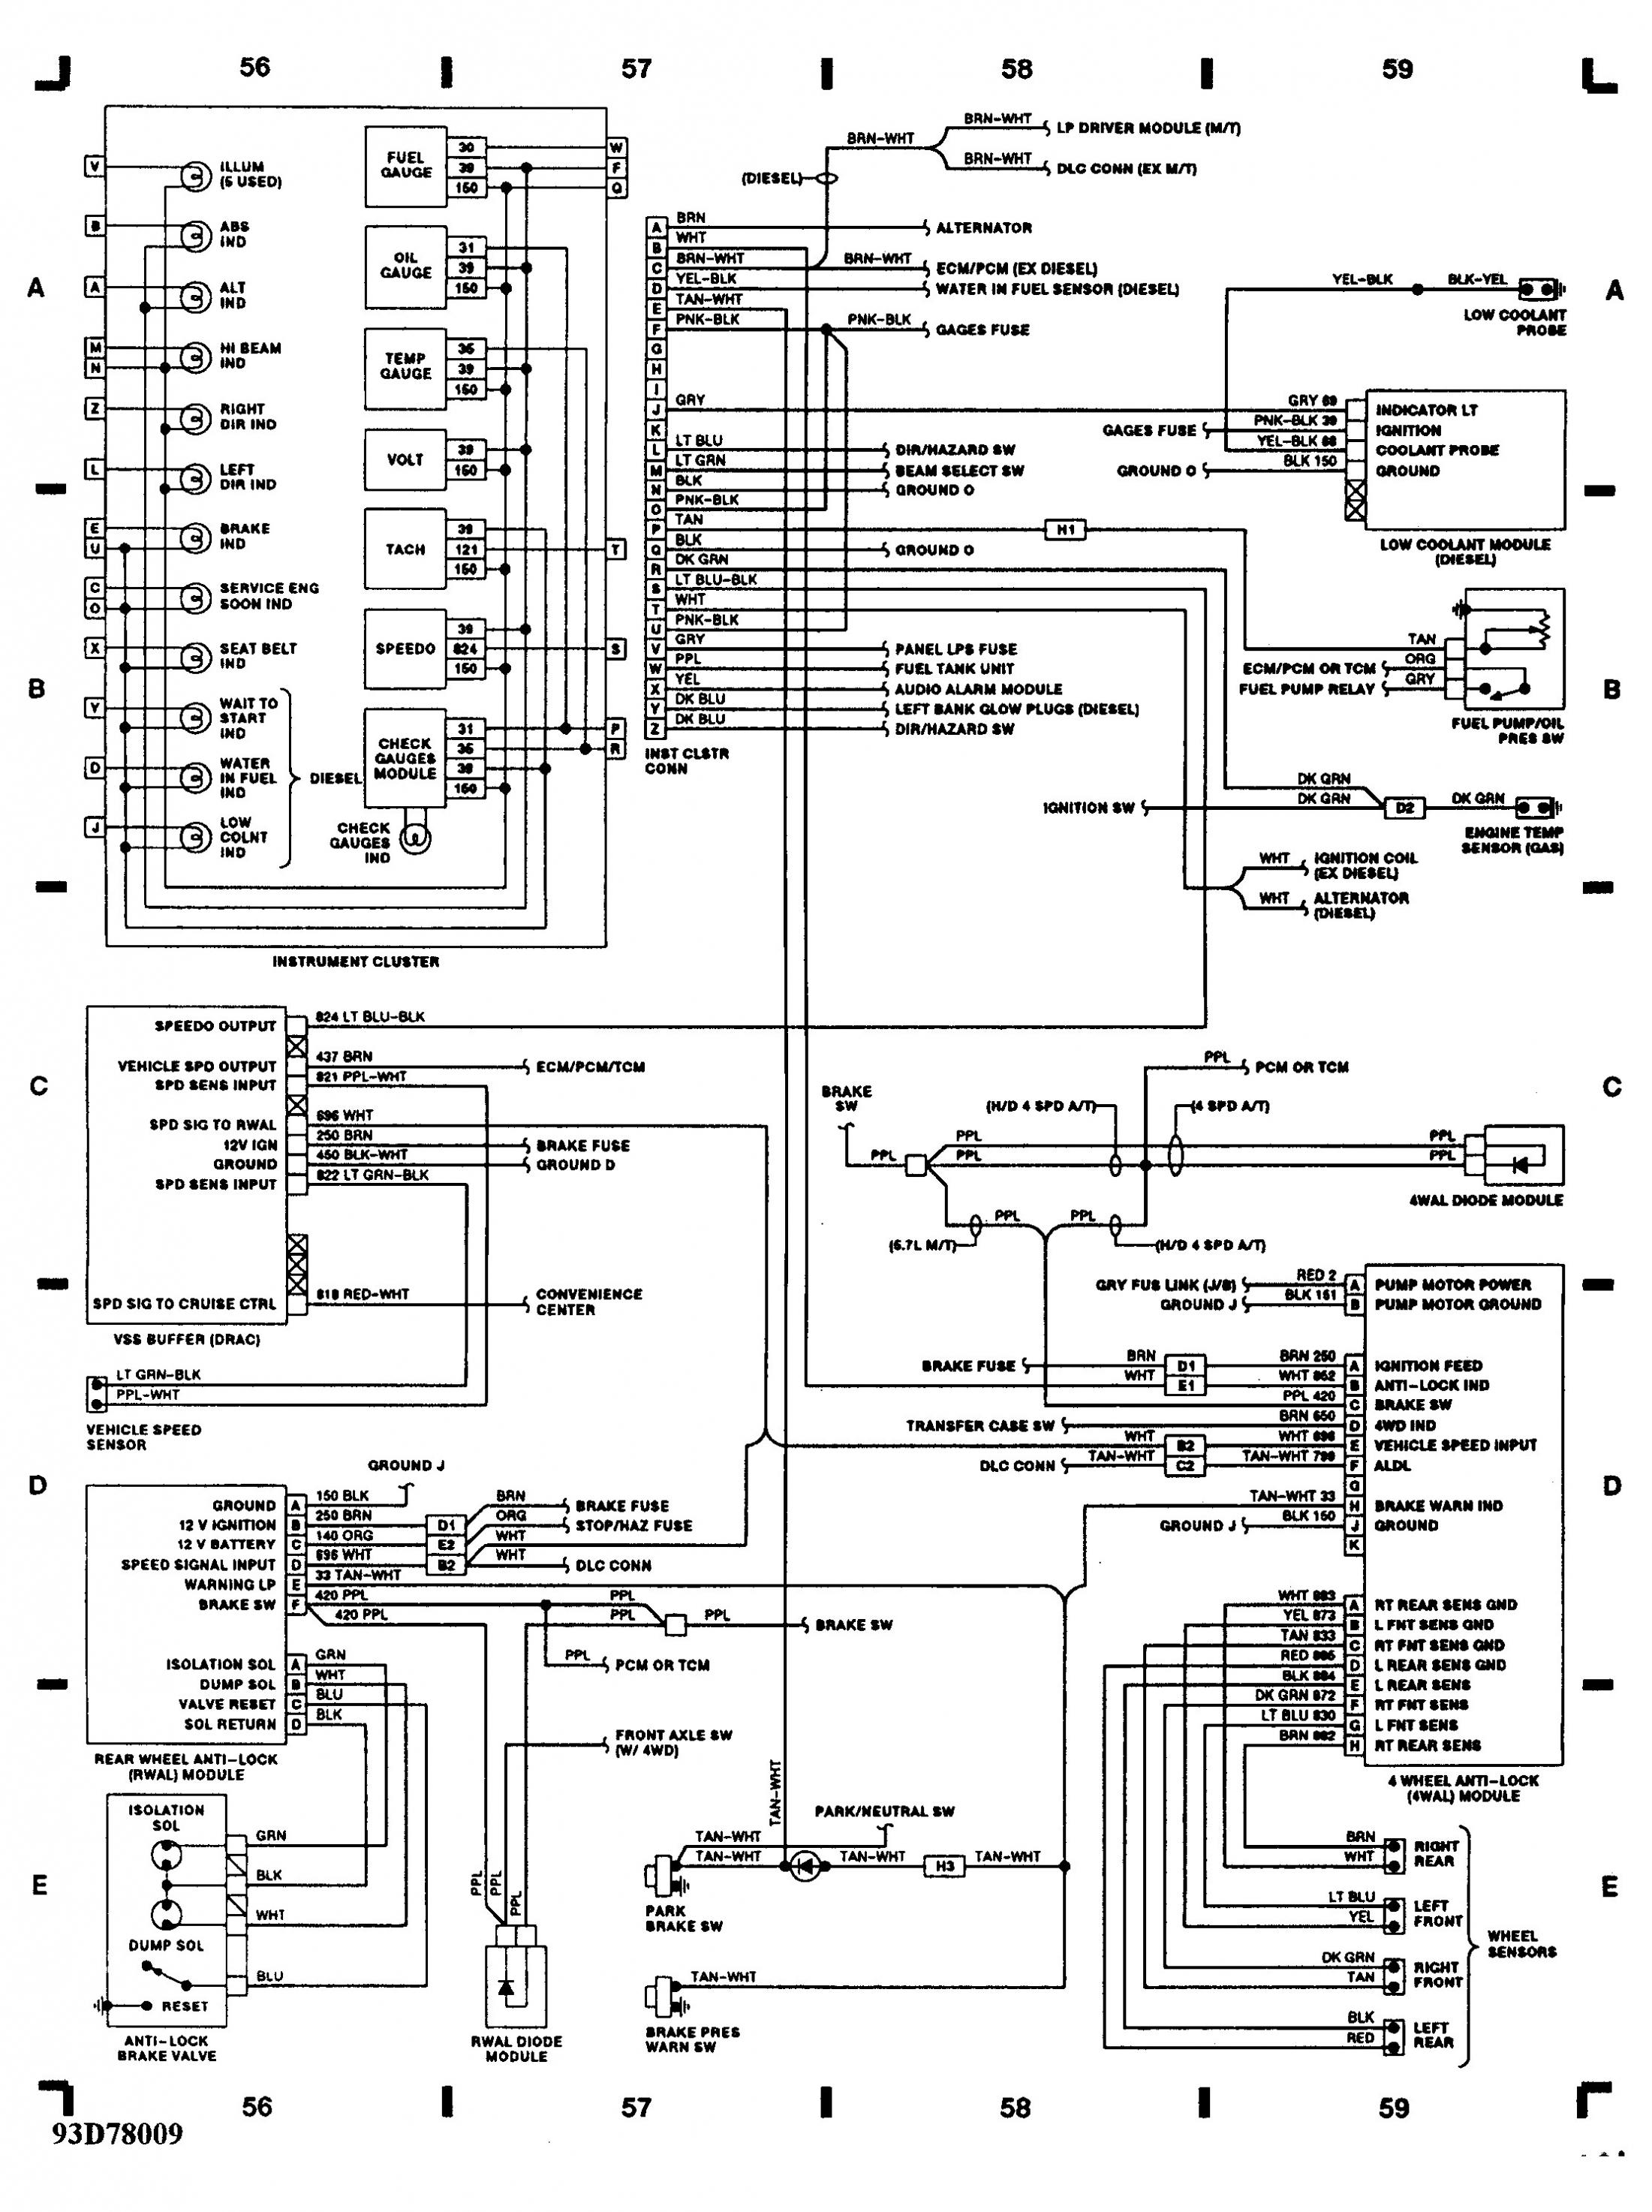 Tpi Gauges Wiring Harness Diagram   Wiring Library - 5.7 Vortec Wiring Harness Diagram